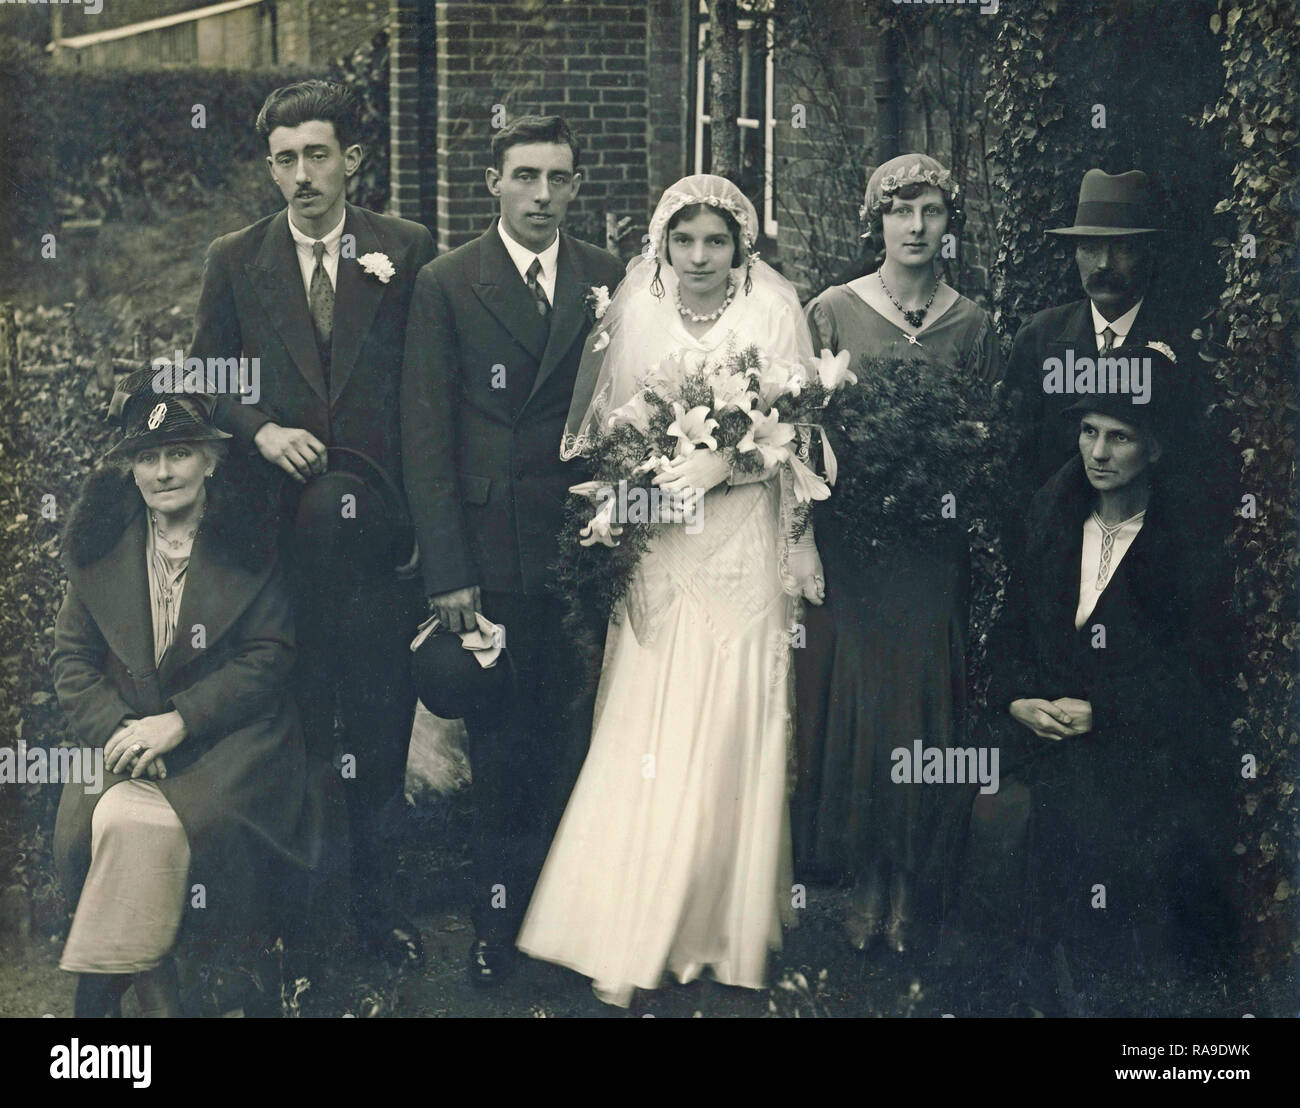 Historic Archive Image of wedding, c1930s - Stock Image